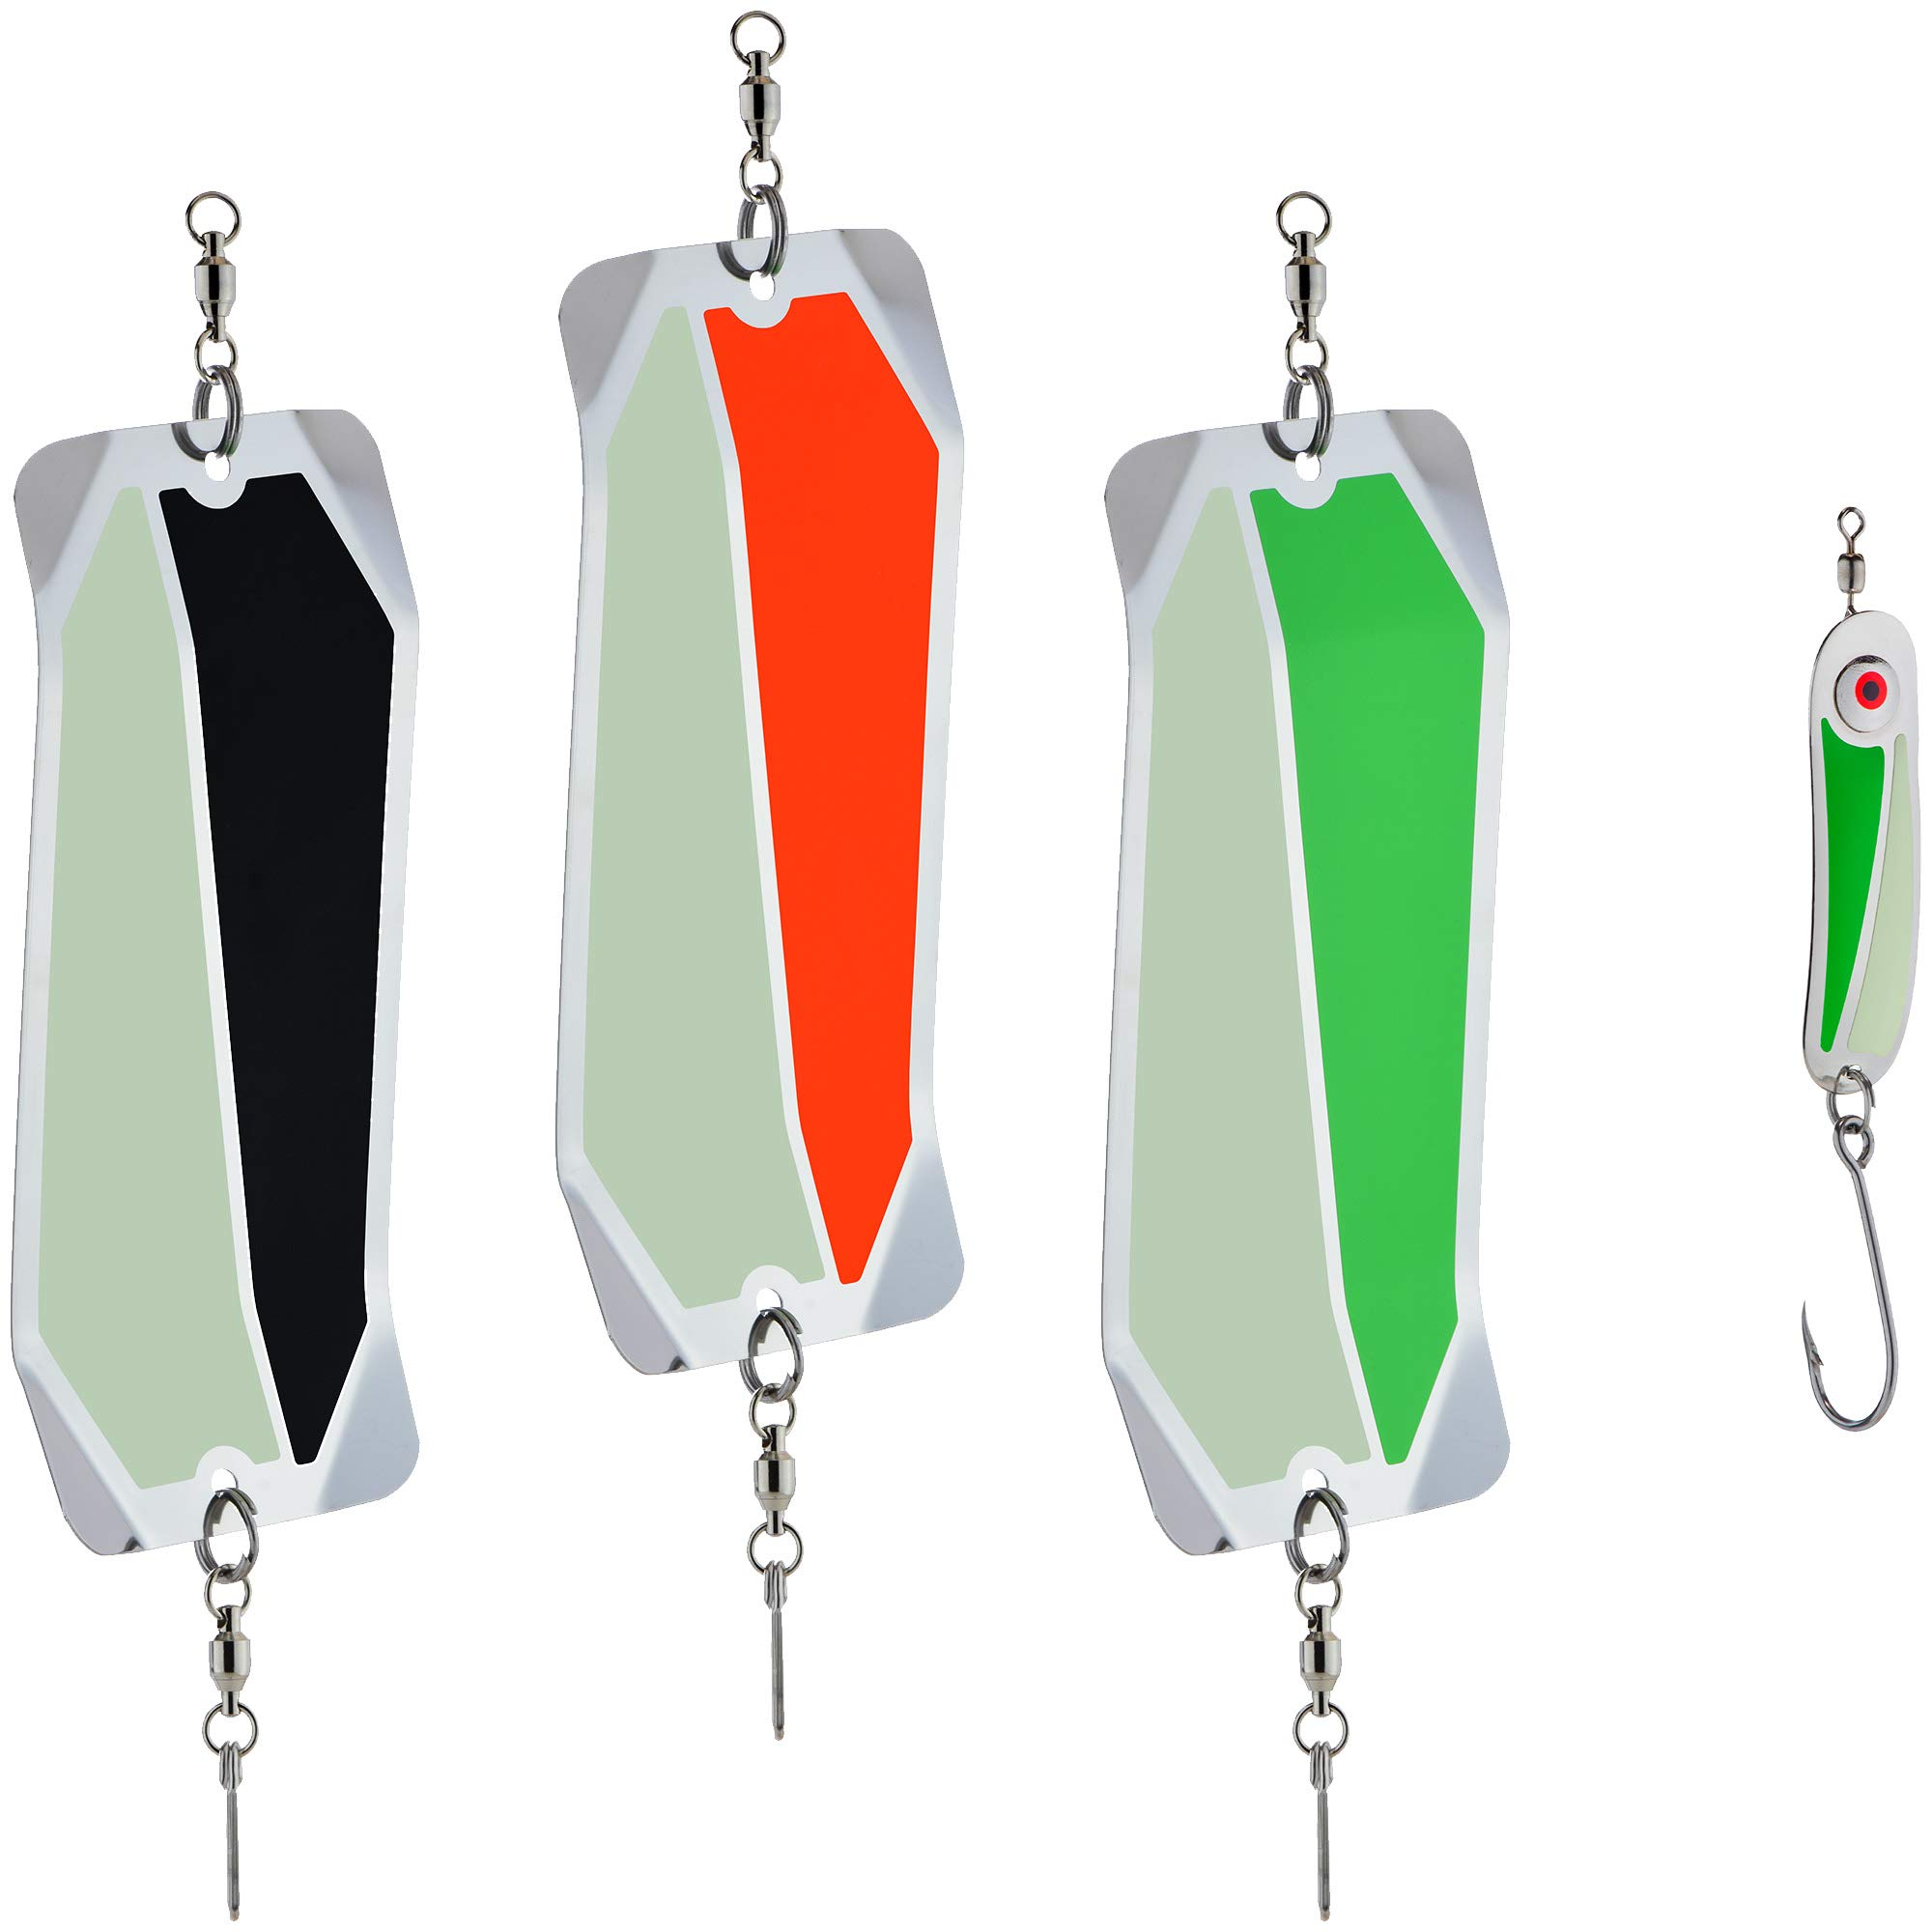 PEETZ Stryke Zone 7-Inch 'Dirty Water' Fishing Dodger 3-Pack + Bonus Spoon Lure | Stainless Steel | Darting Action for Kokanee Fishing